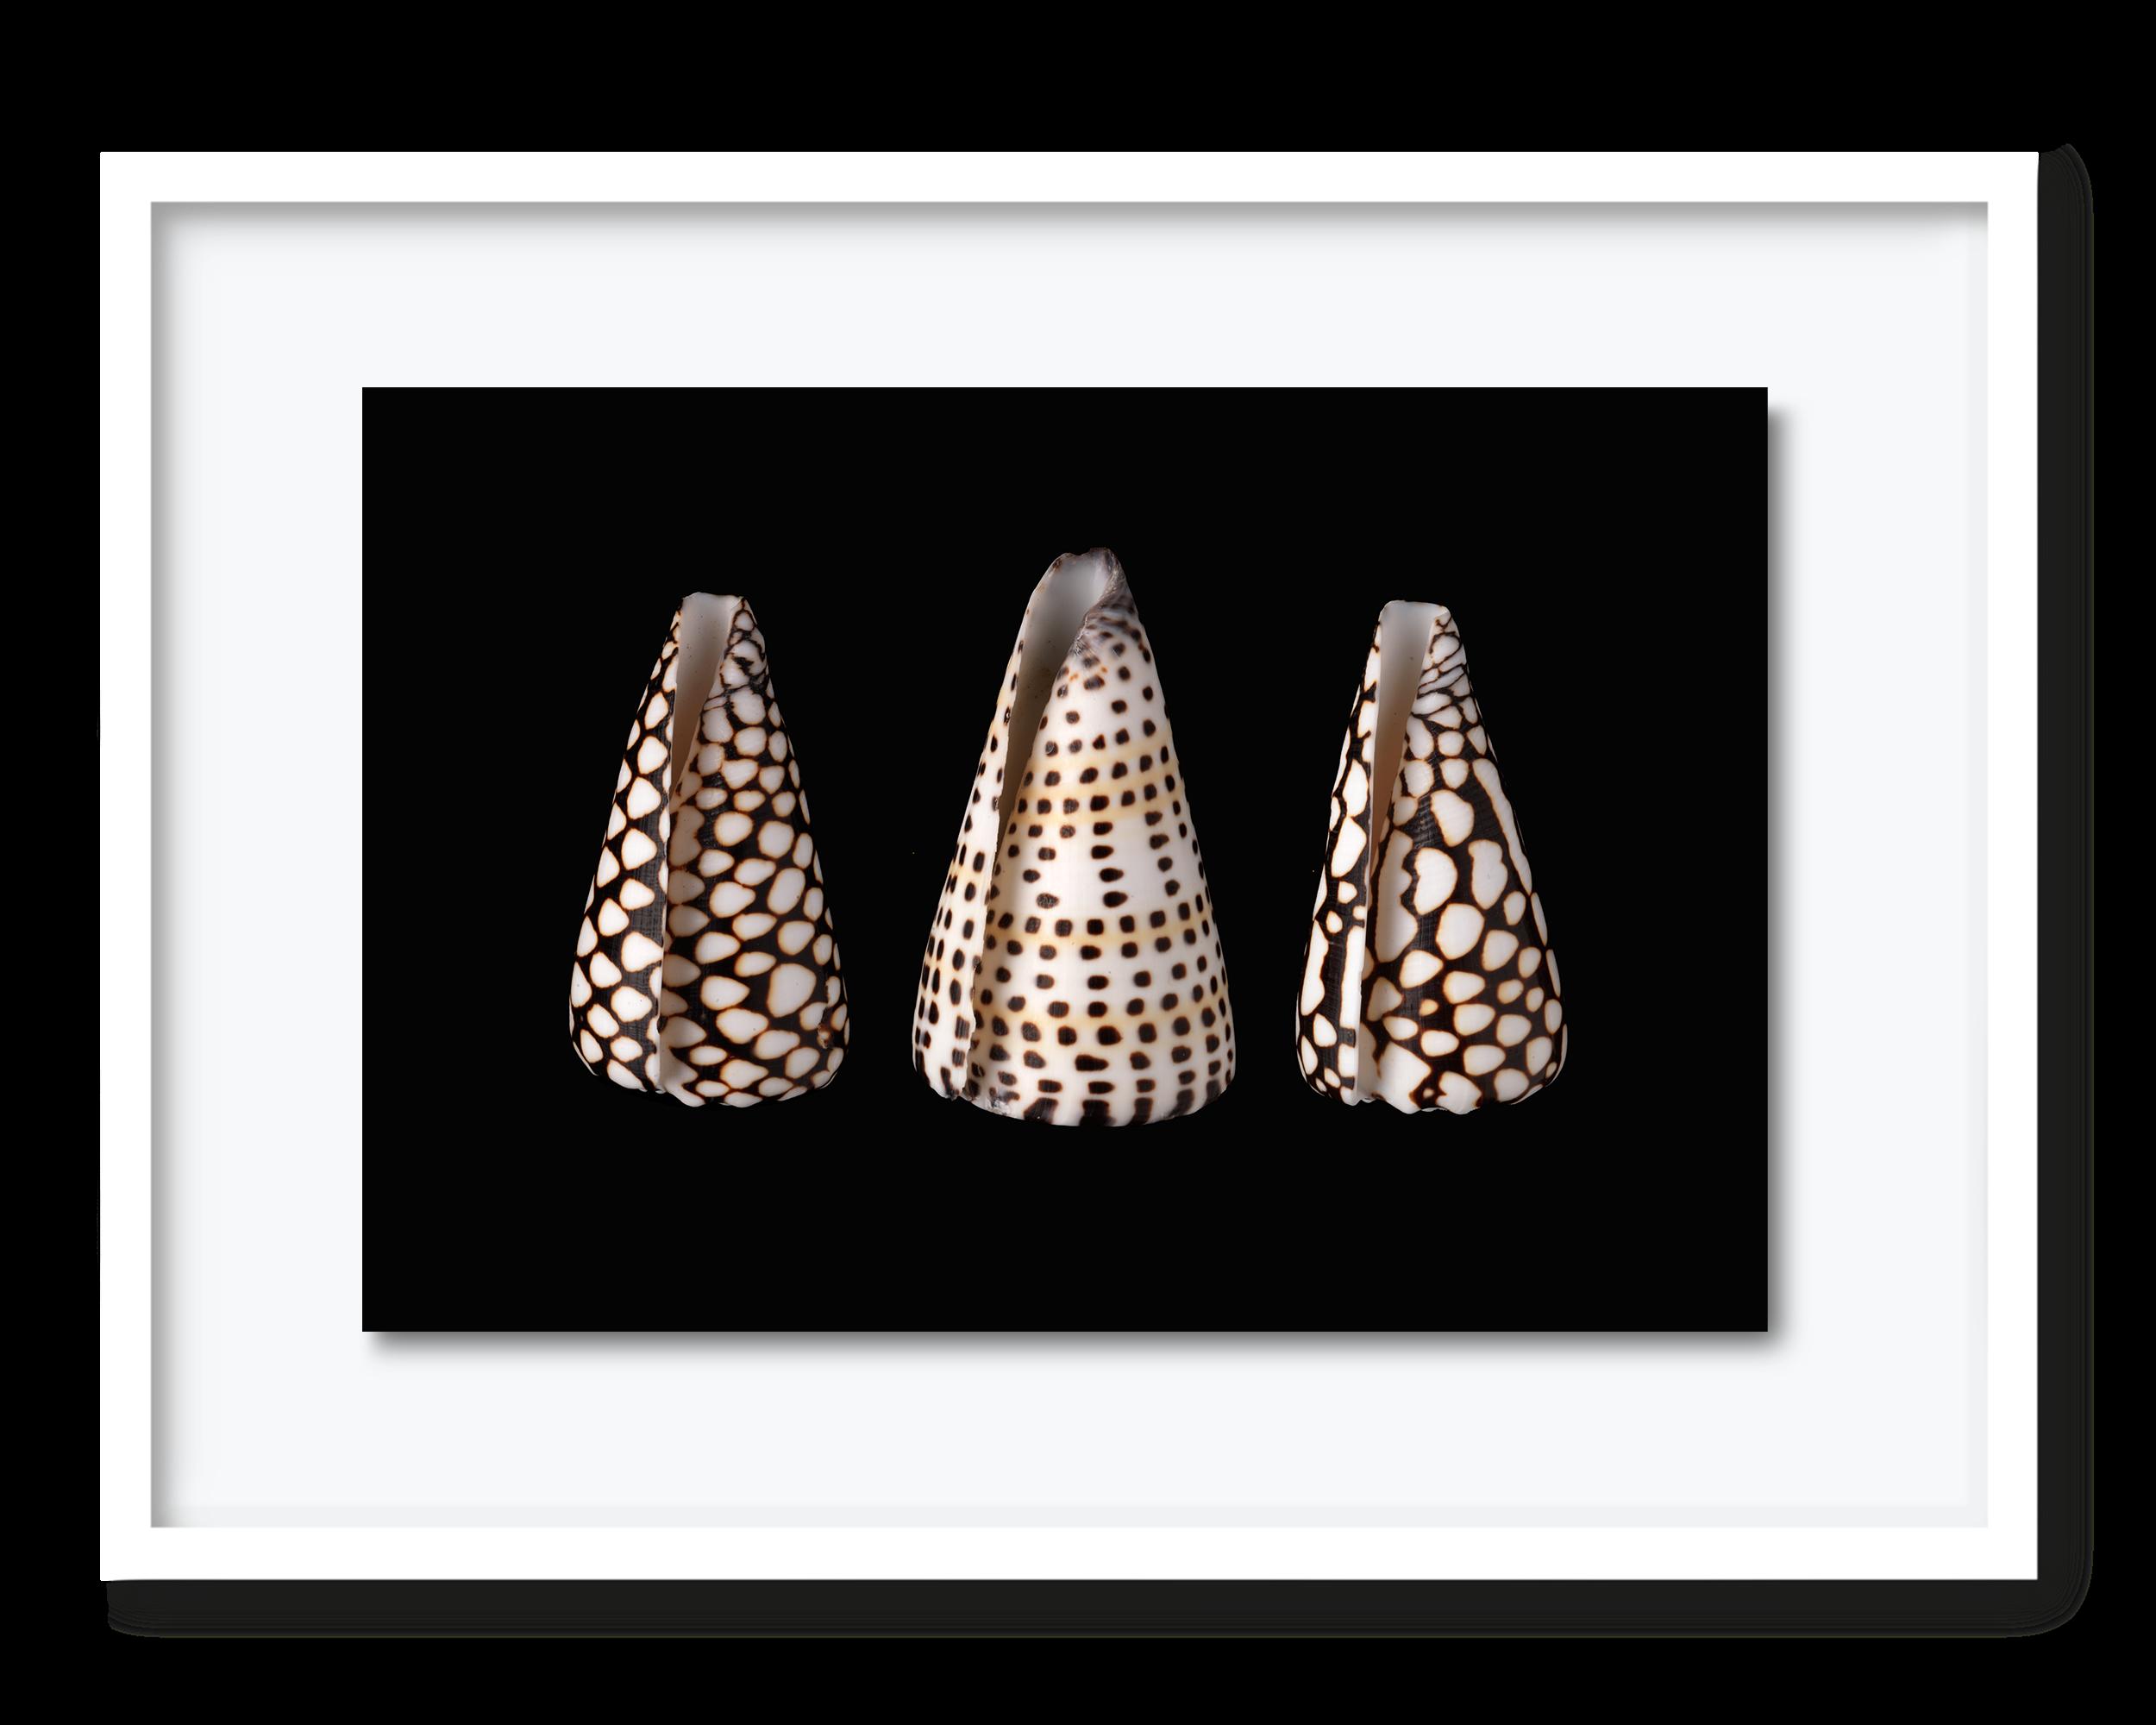 53.david-pearce-shells.png